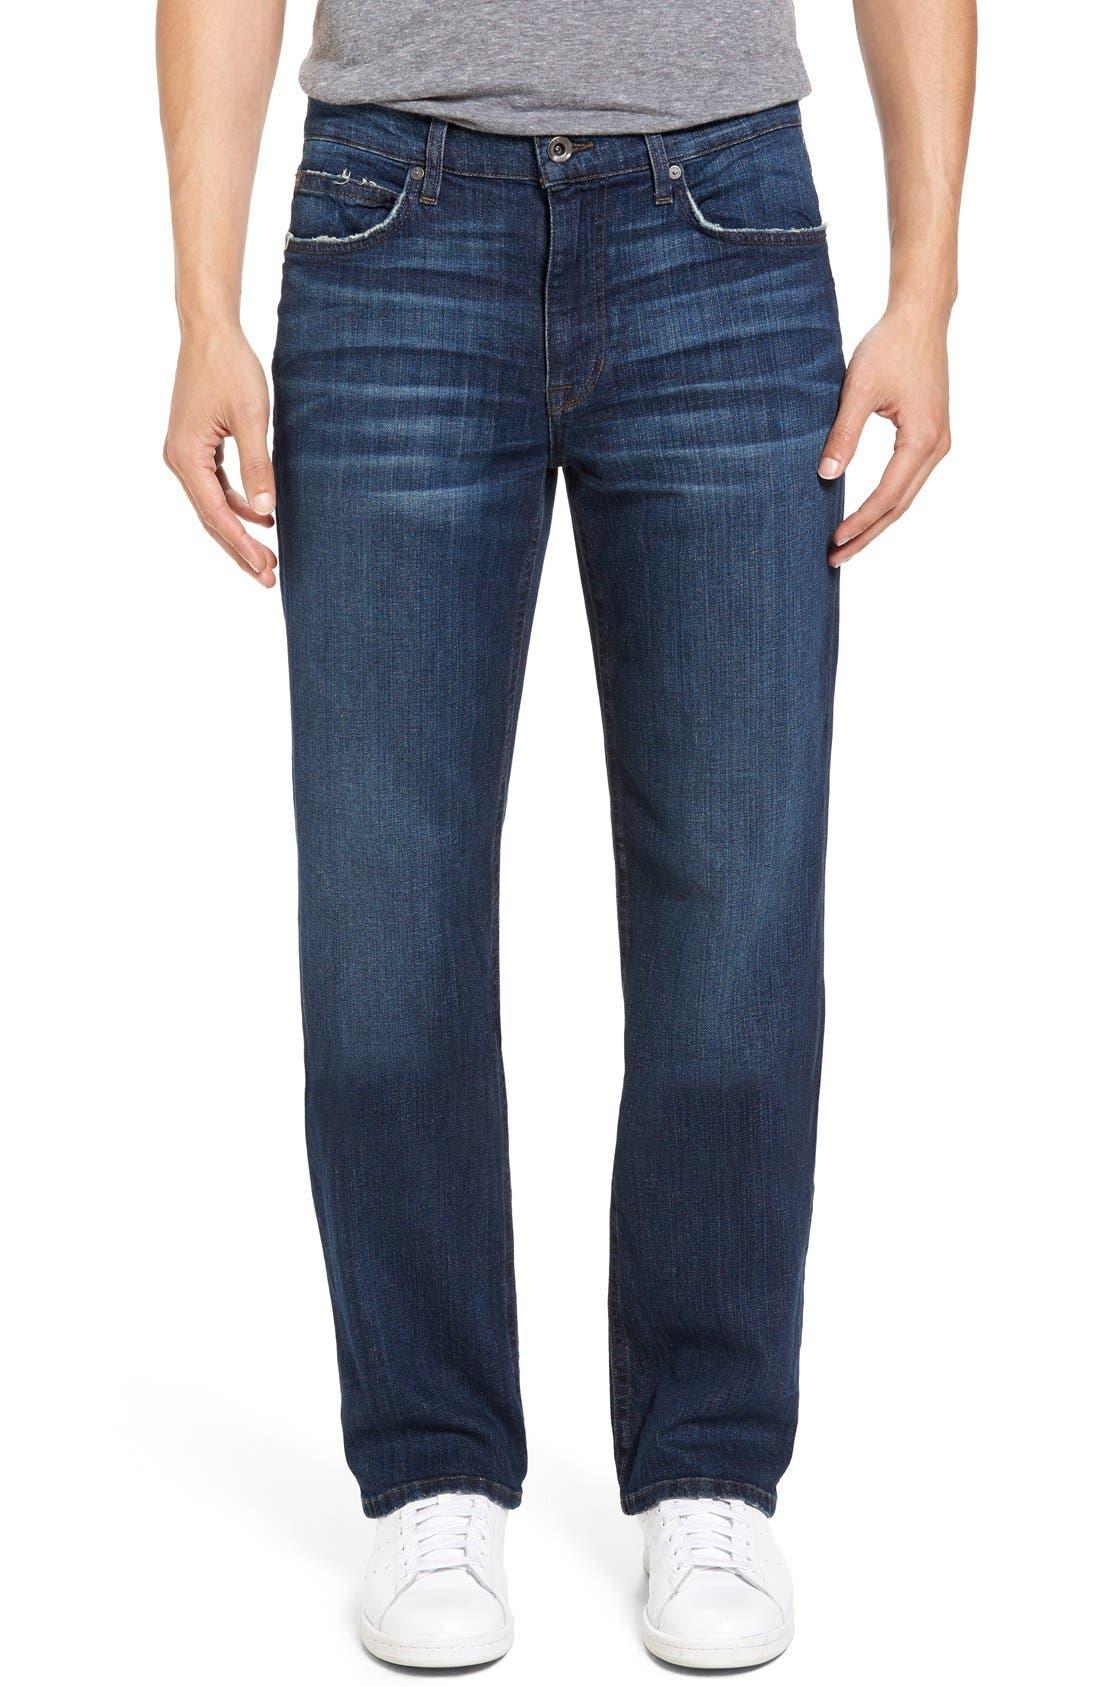 Alternate Image 1 Selected - Joe's Rebel Relaxed Fit Jeans (Kane)